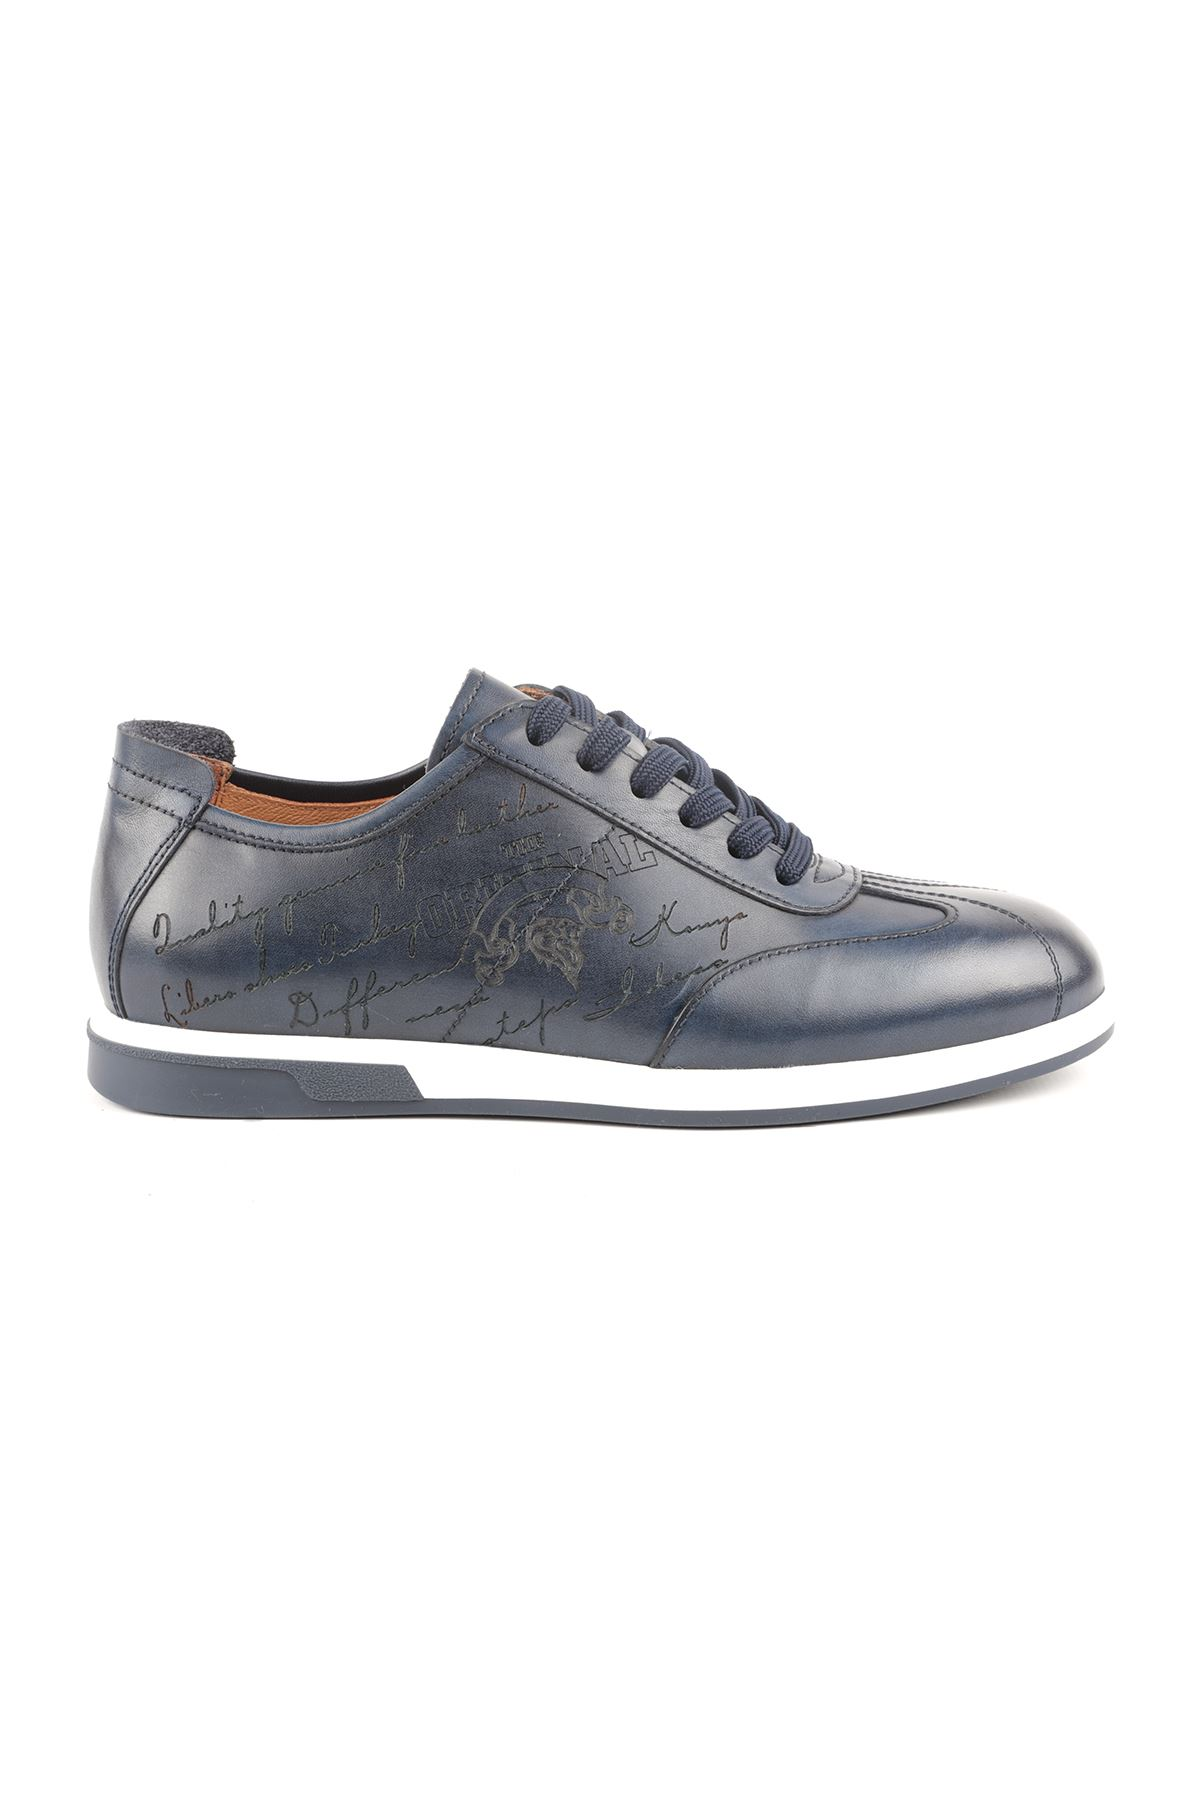 Libero L3772 Navy Blue Men Sport Shoes